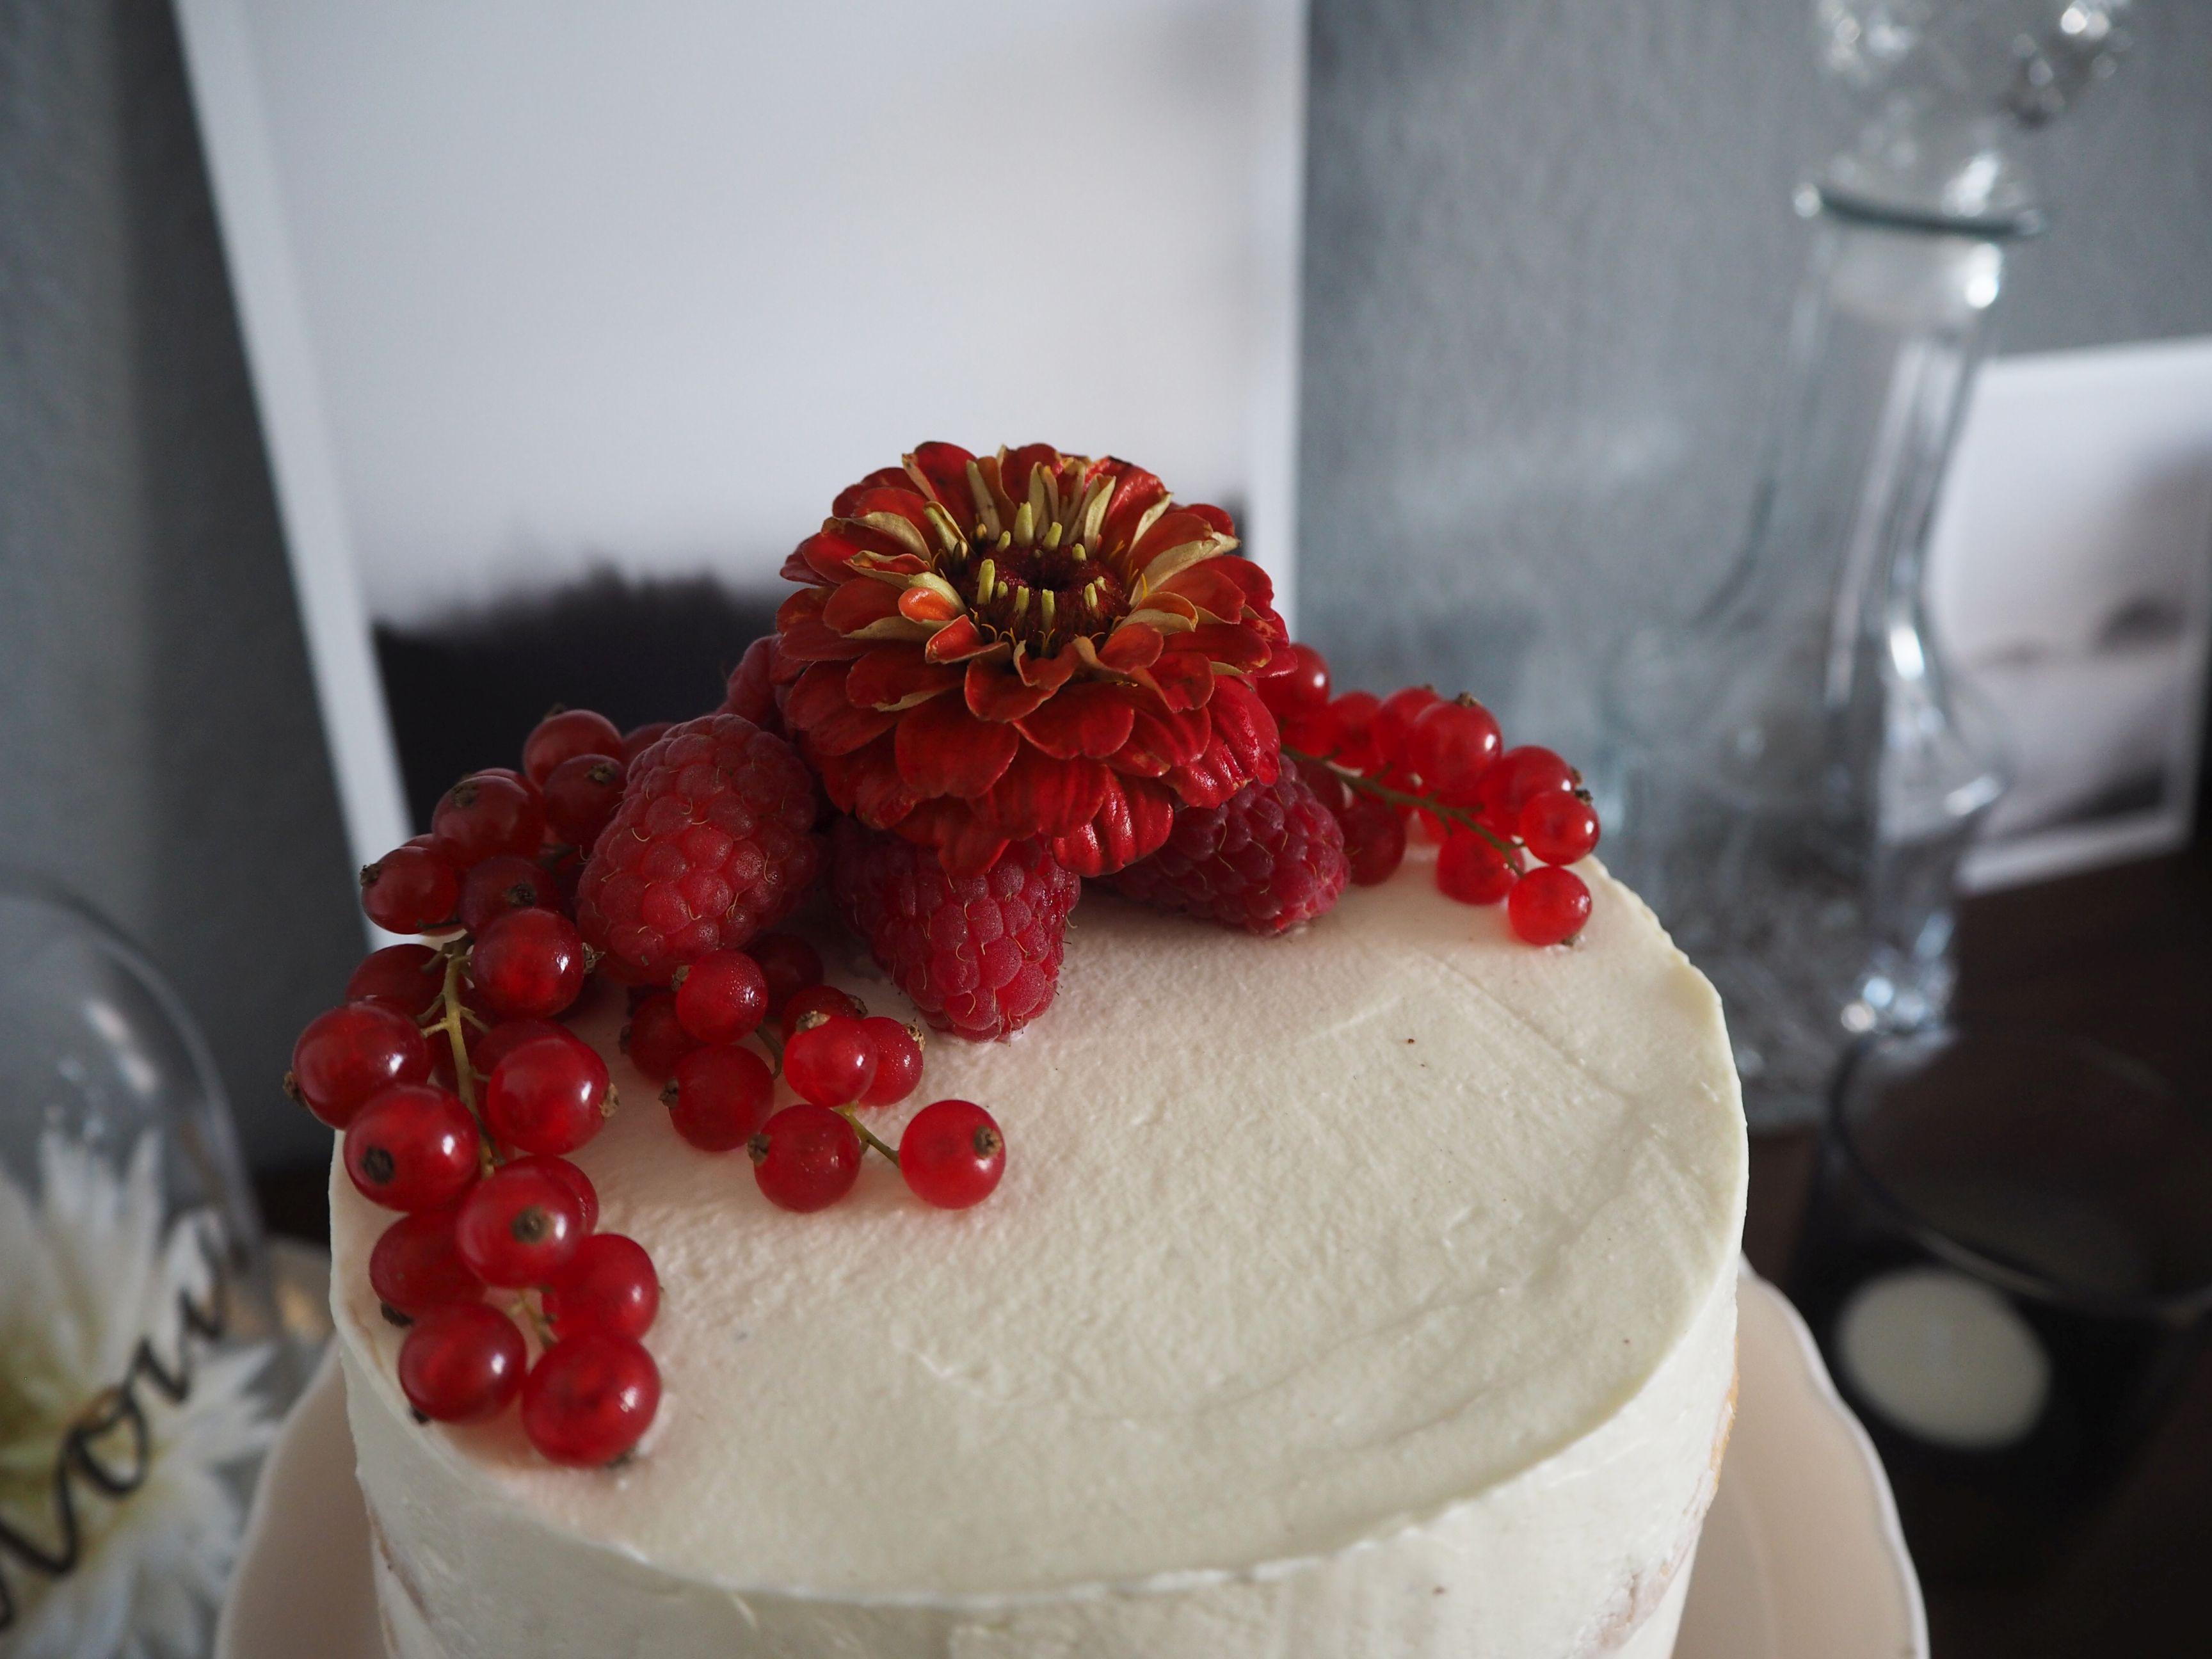 2018-05-skoen-och-kreativ-foodberry-semi-naked-cake-beeren-torte-zum-muttertag (4)